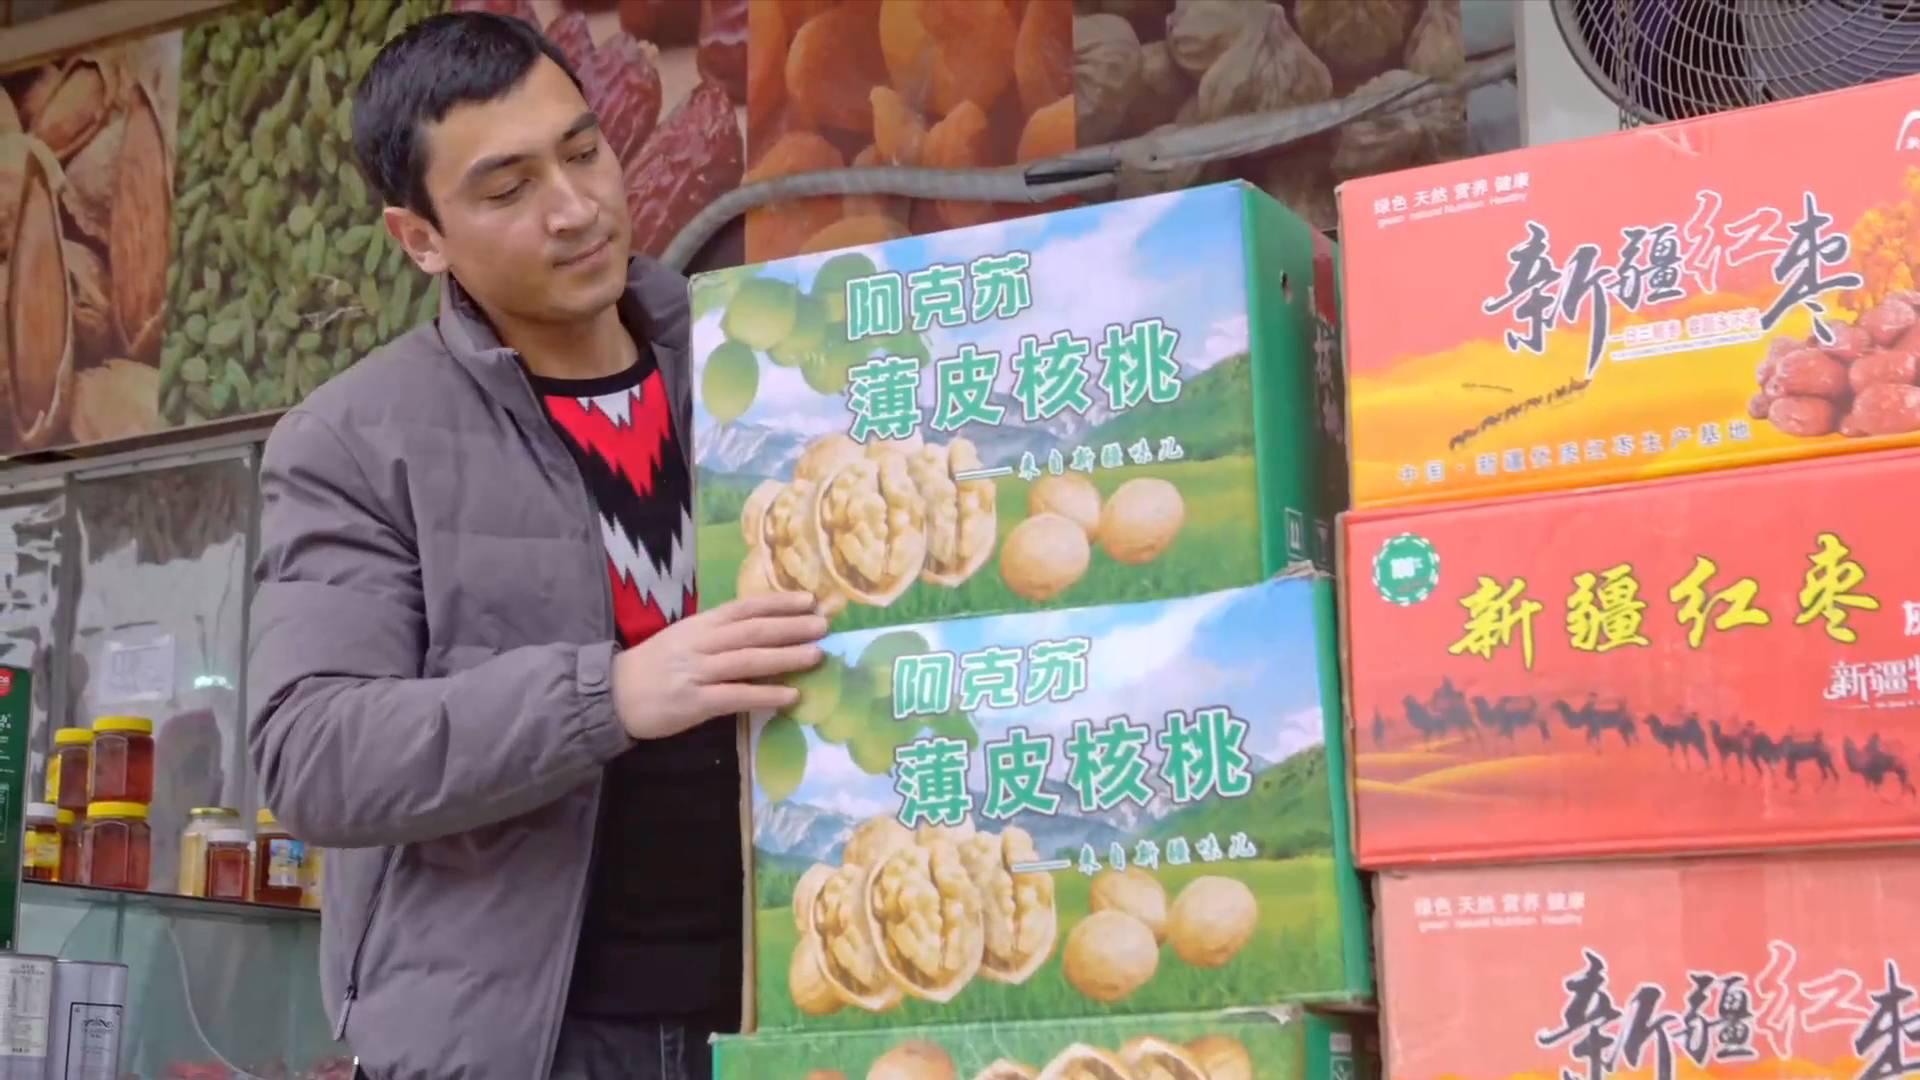 GLOBALink | Xinjiang, My Home: Dried fruit vendors' dreams